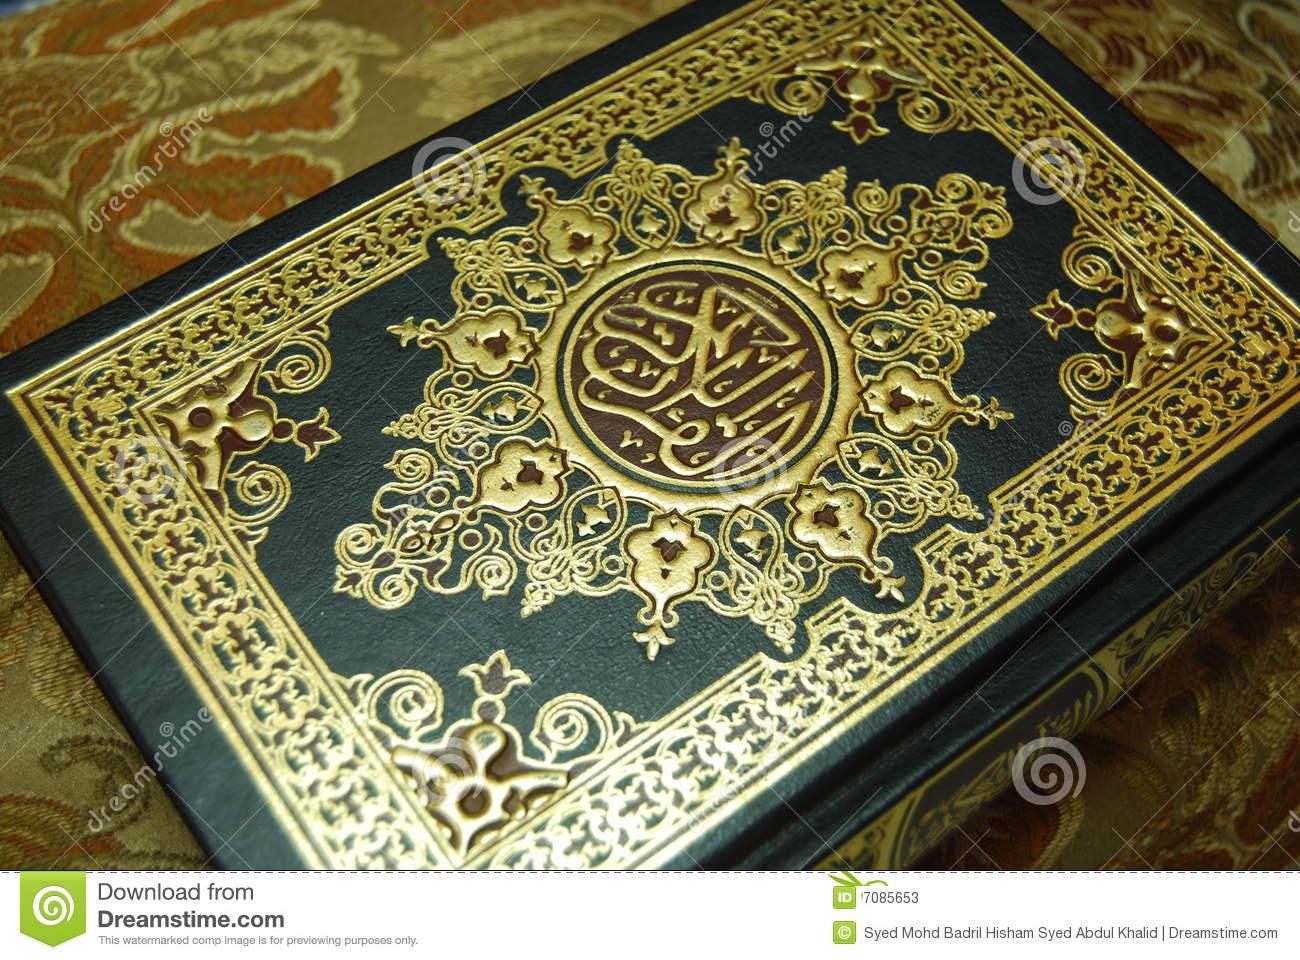 free hd holy quran image